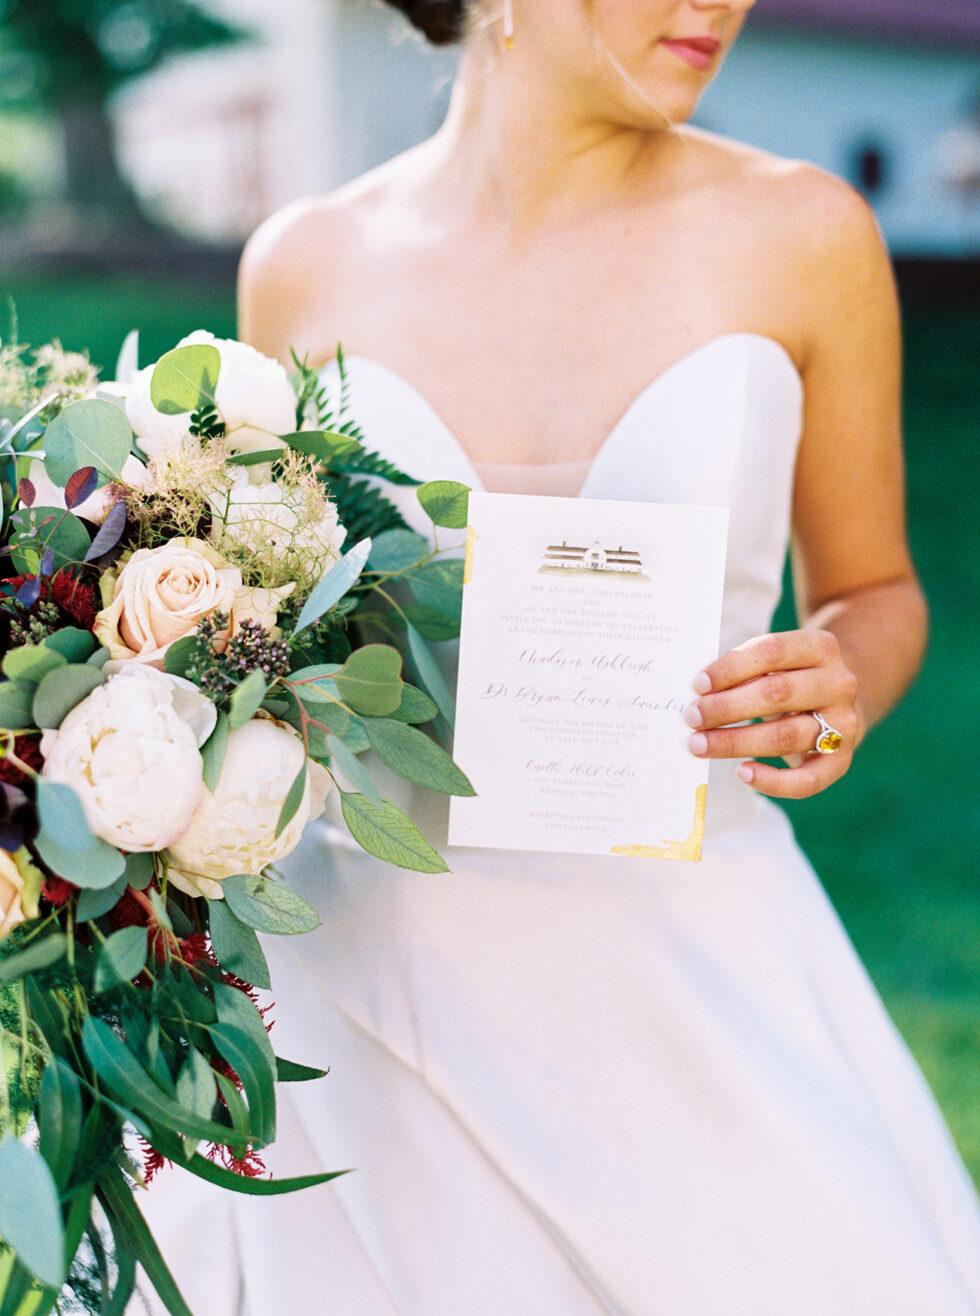 The-Prettiest-Pieces-Fall-Wedding-Winmock-North-Carolina-18